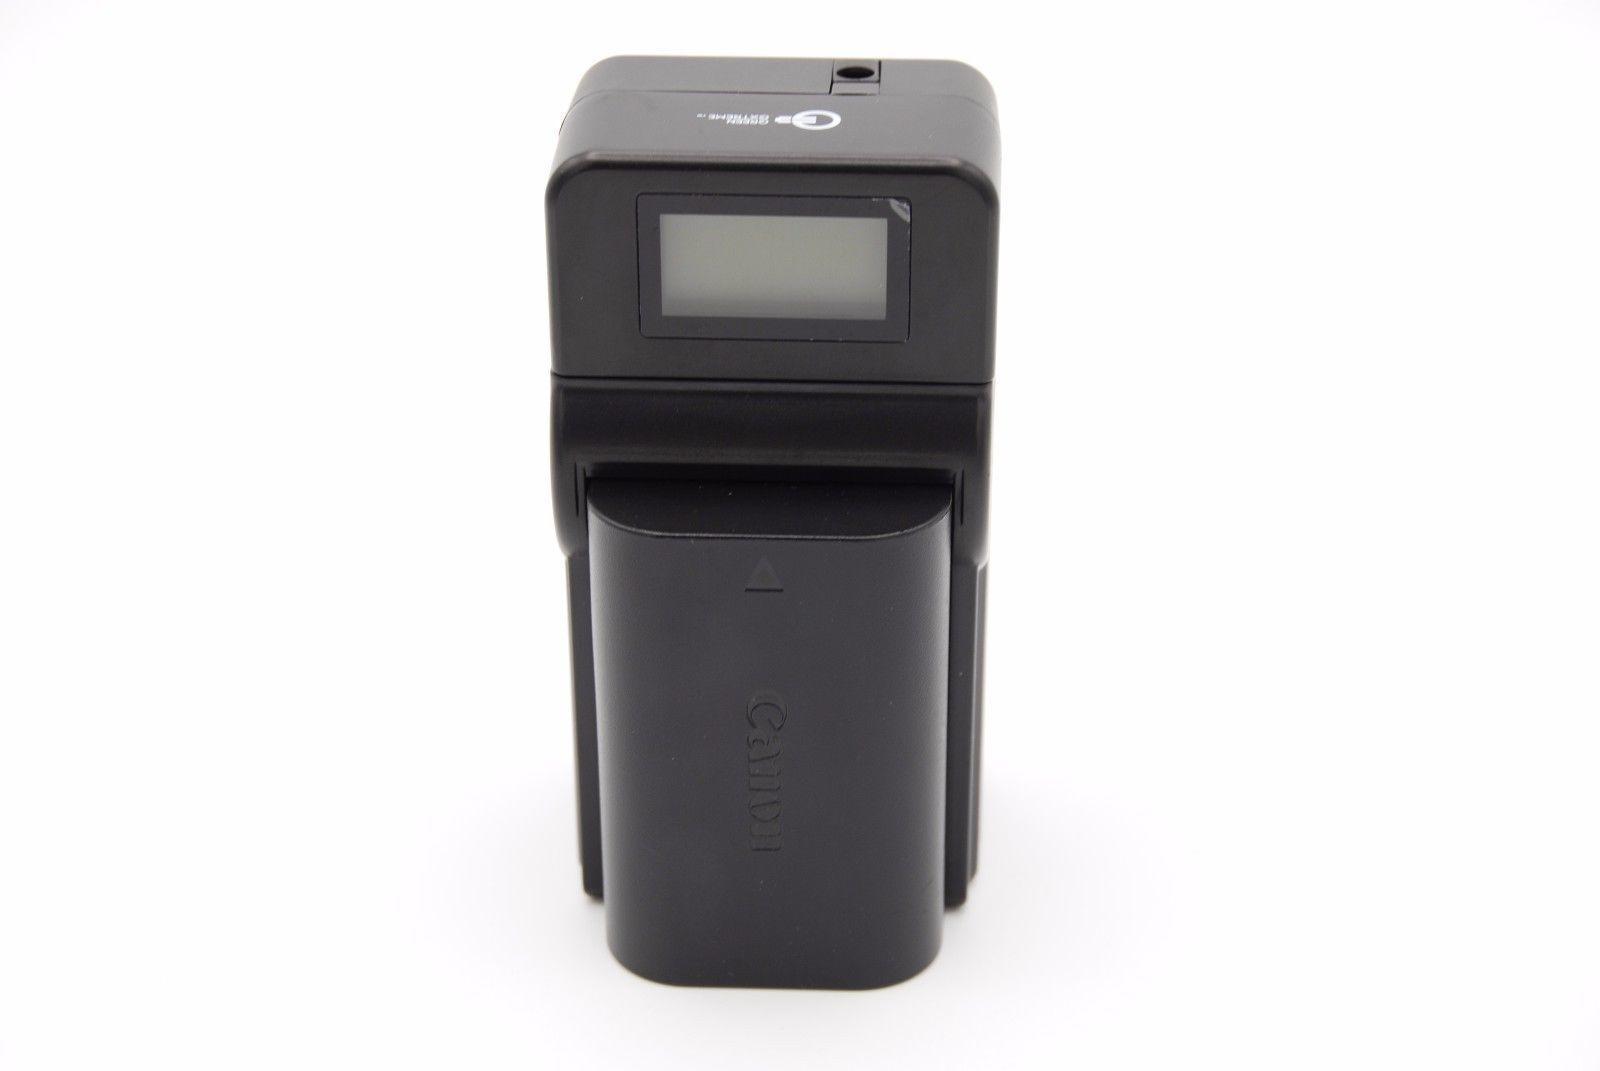 Canon EOS 5D Mark II 21.1mp 7.6cmscreen and similar items